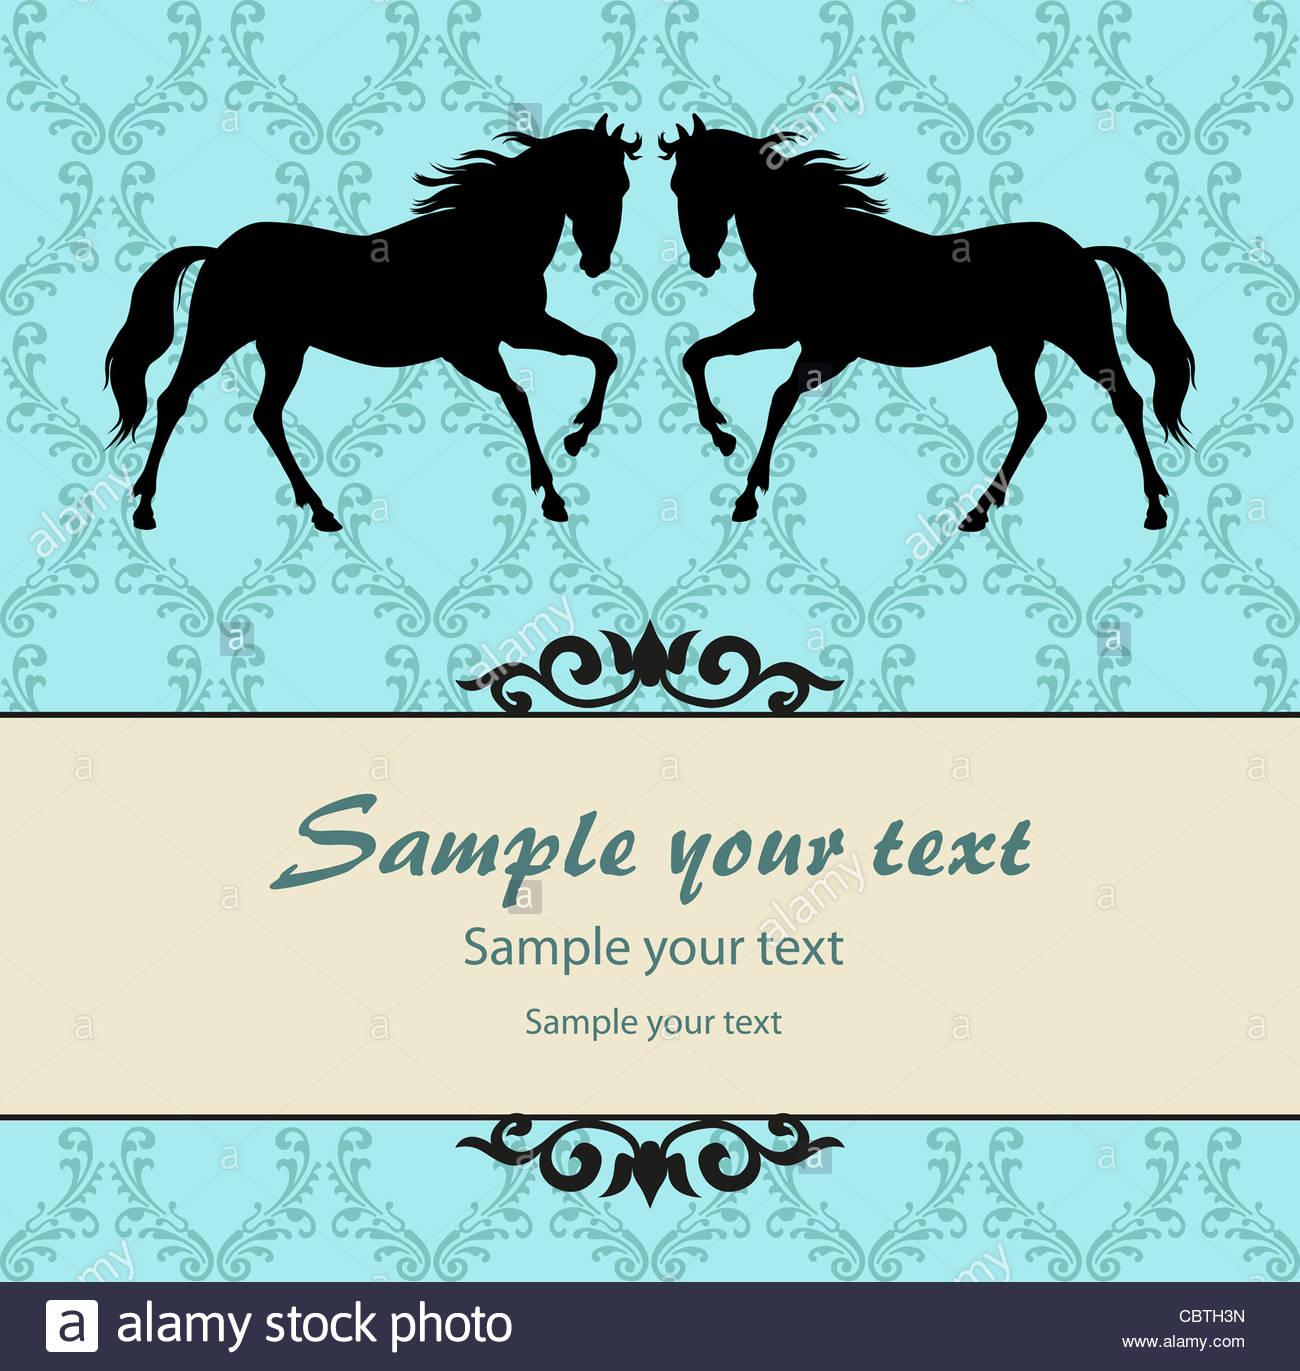 Horse Illustration Stock Photos Amp Horse Illustration Stock